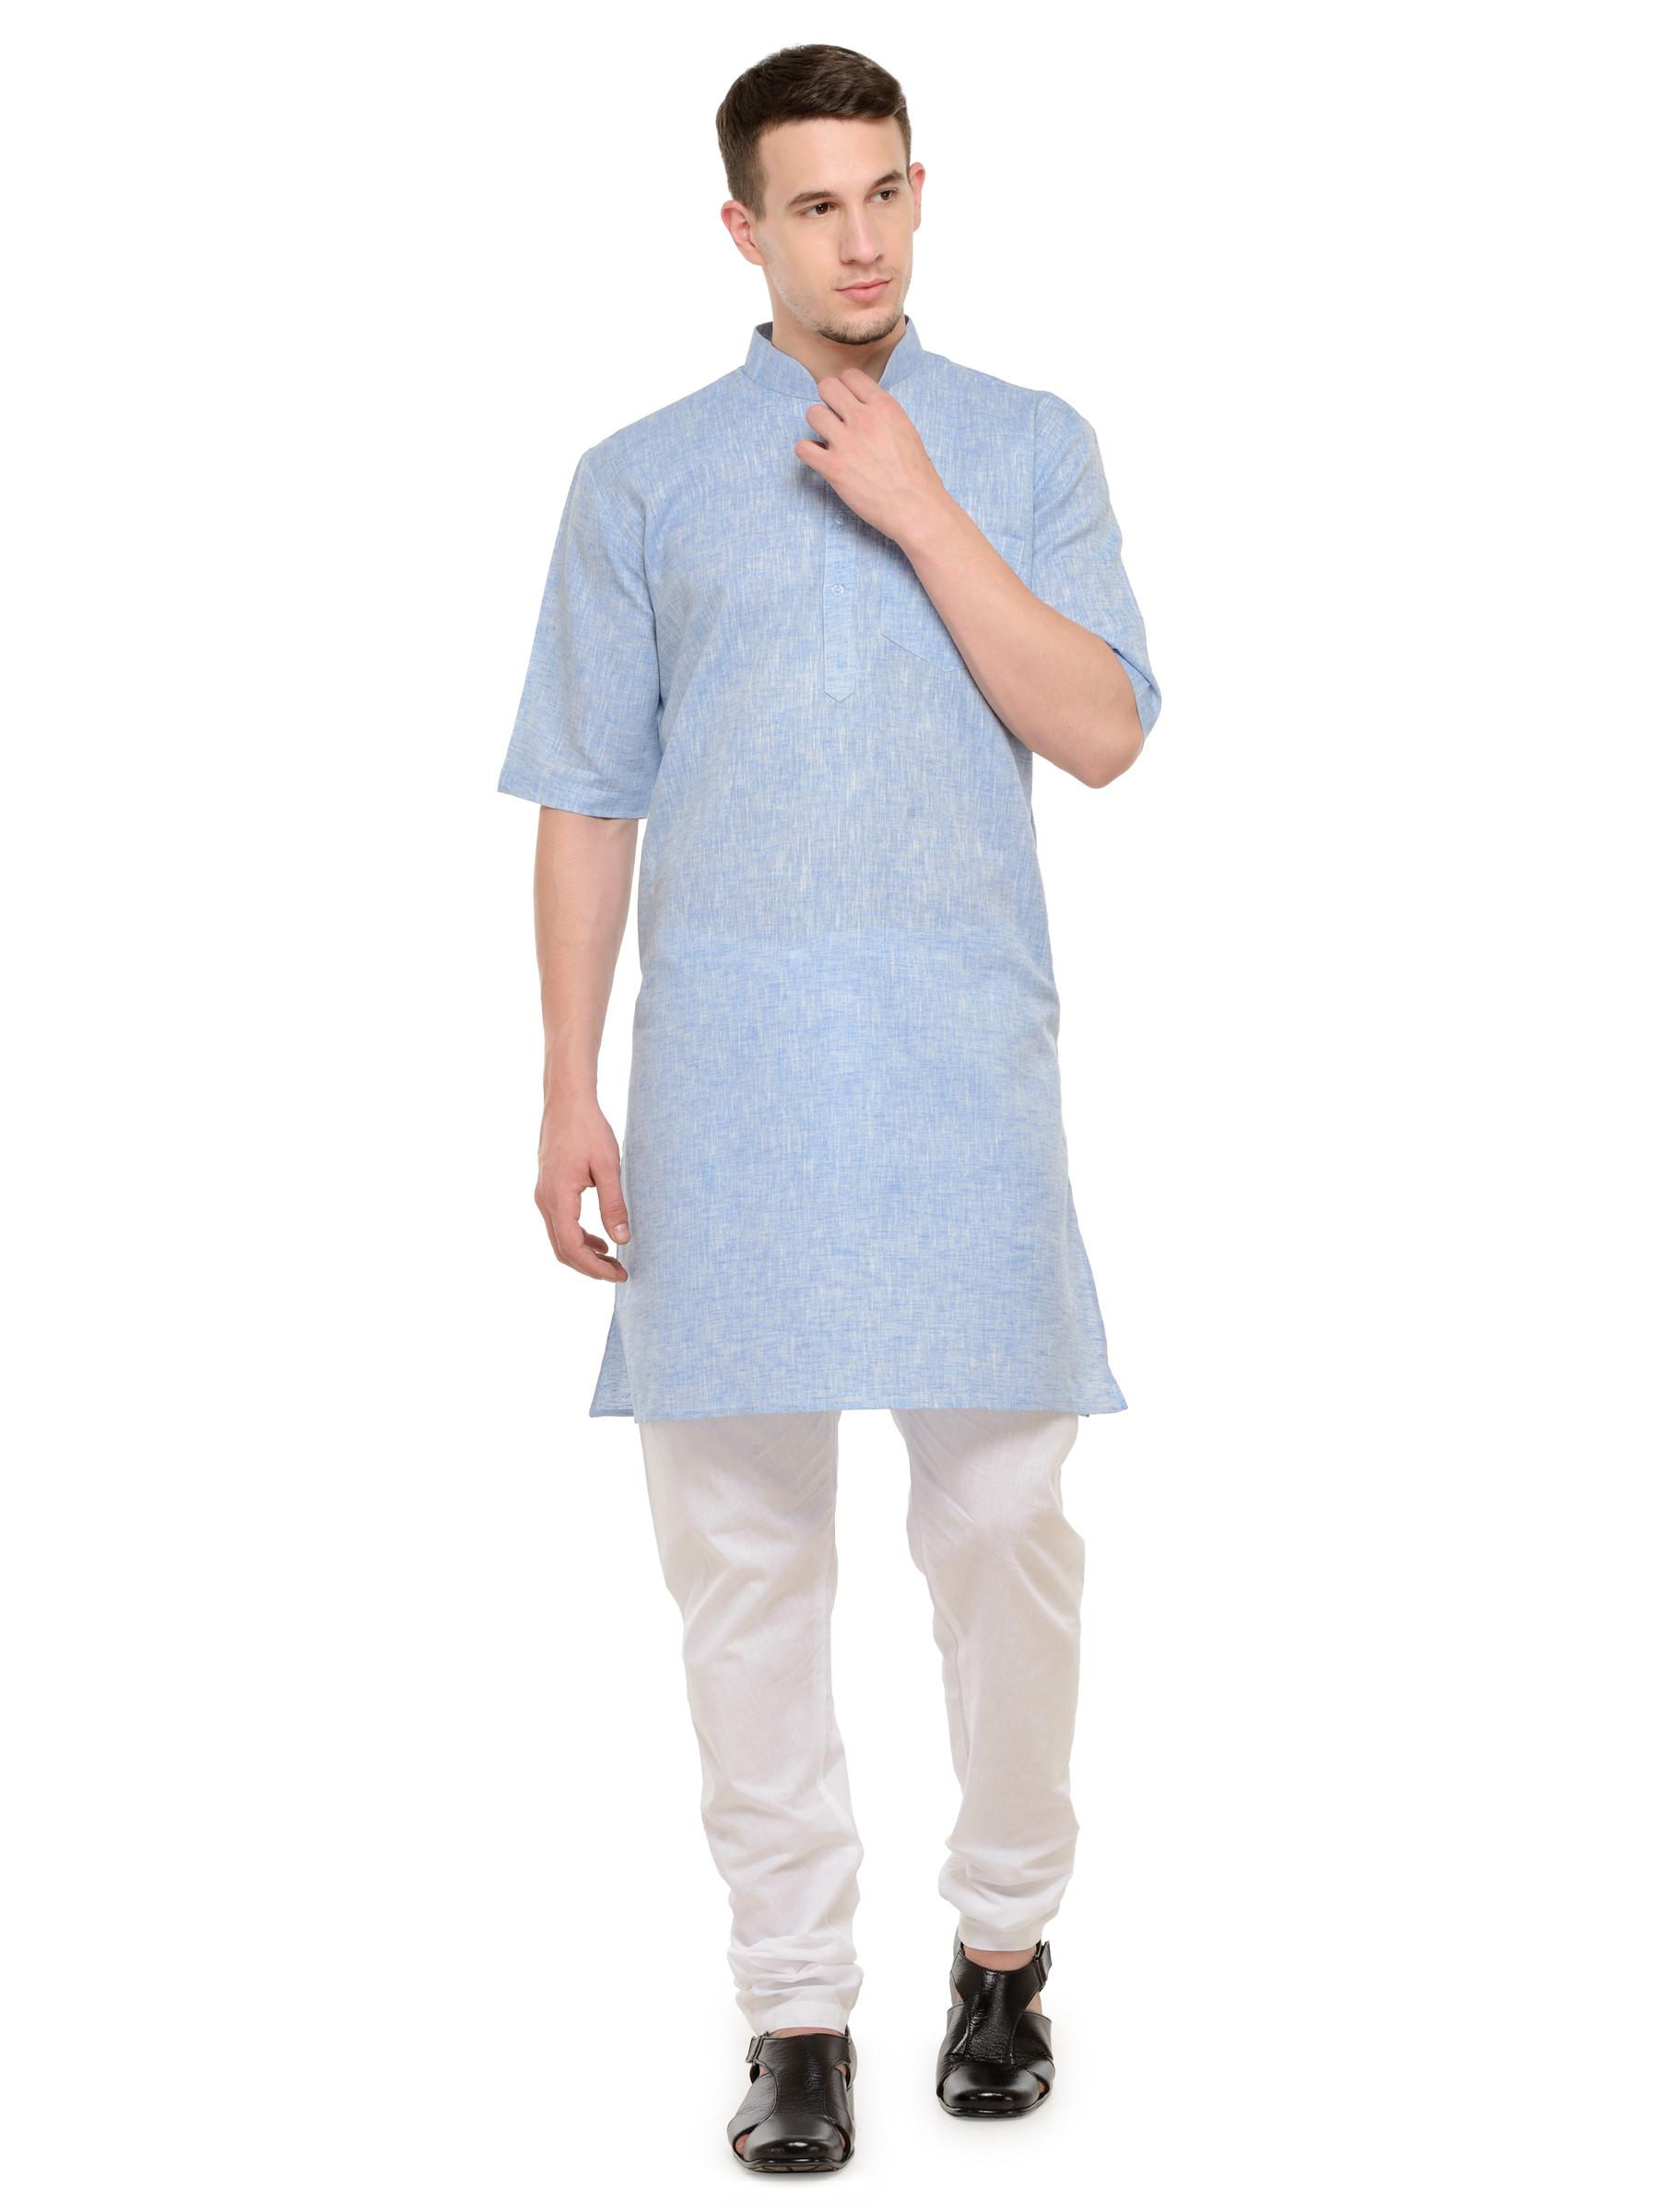 2be734ac2c Light Blue and White Modi Kurta and Pyjama Set For Men - RG Designers -  2157848